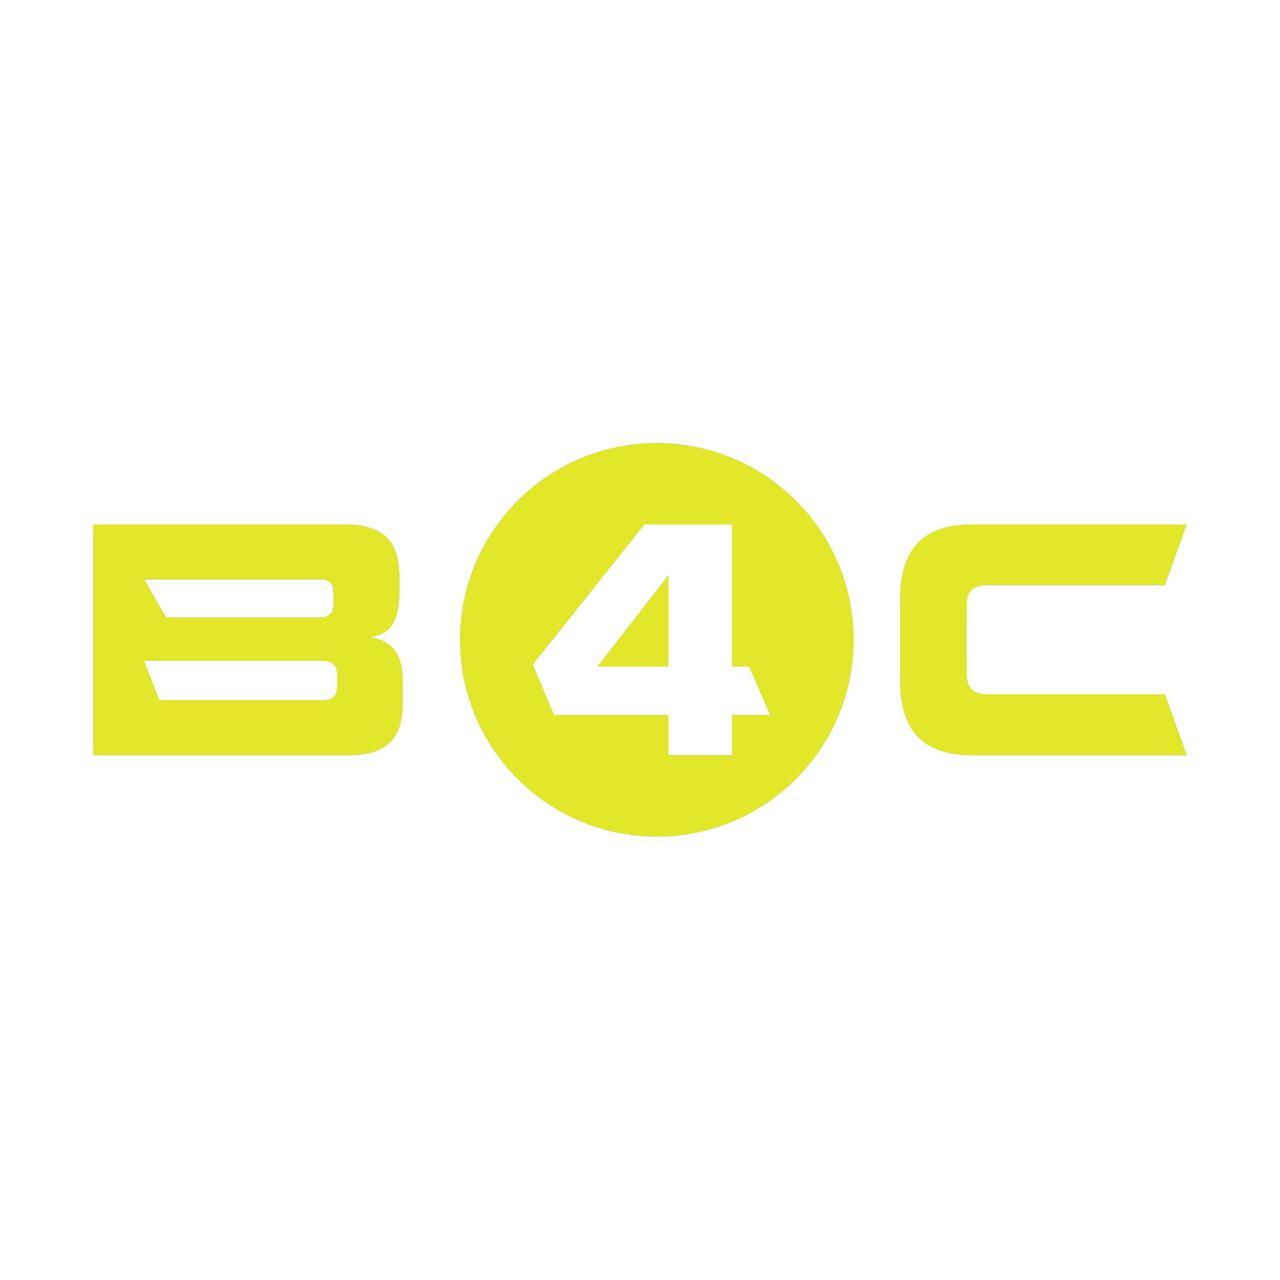 15b4c.jpg